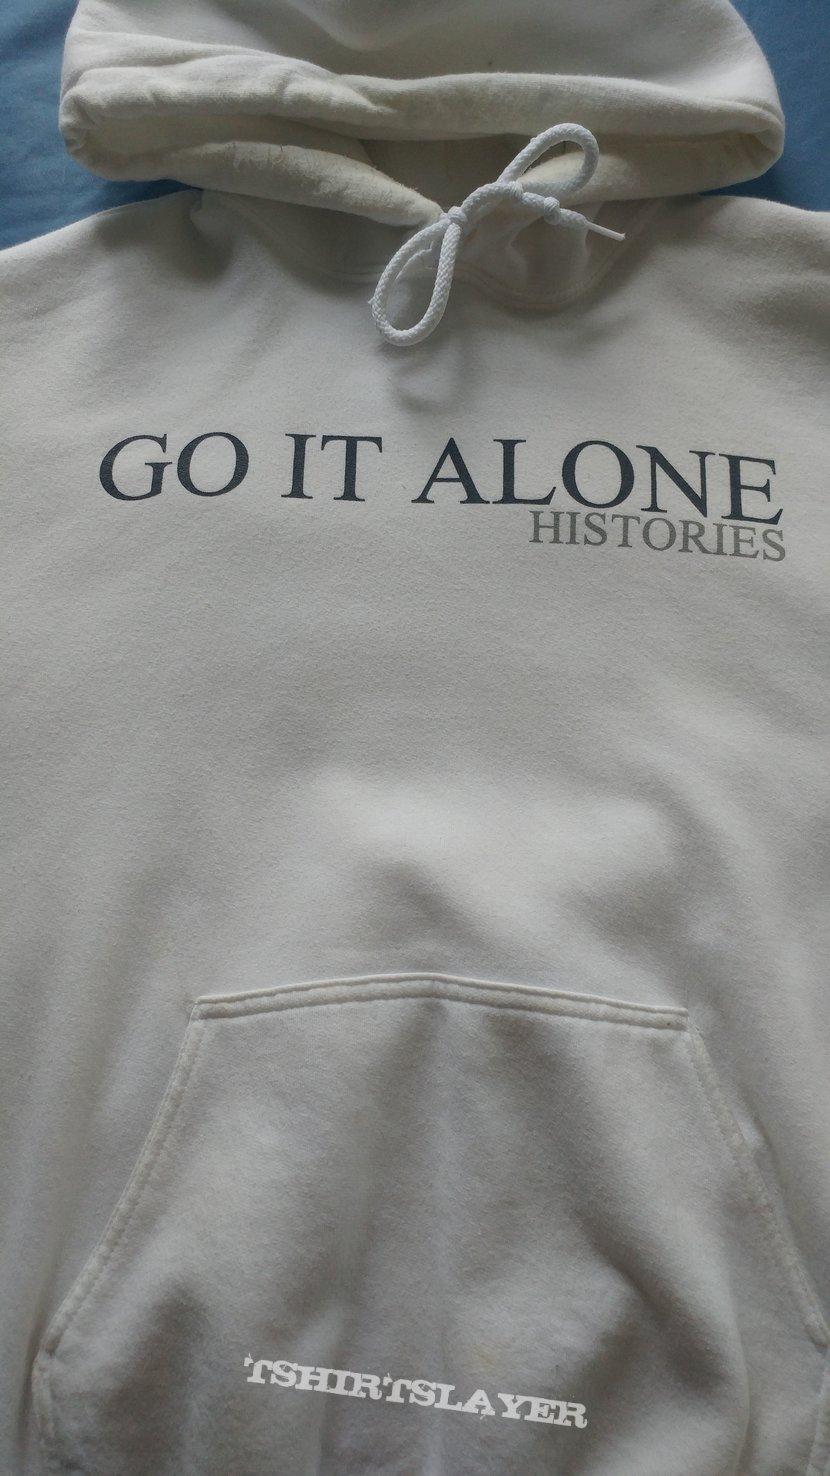 Go It Alone Histories